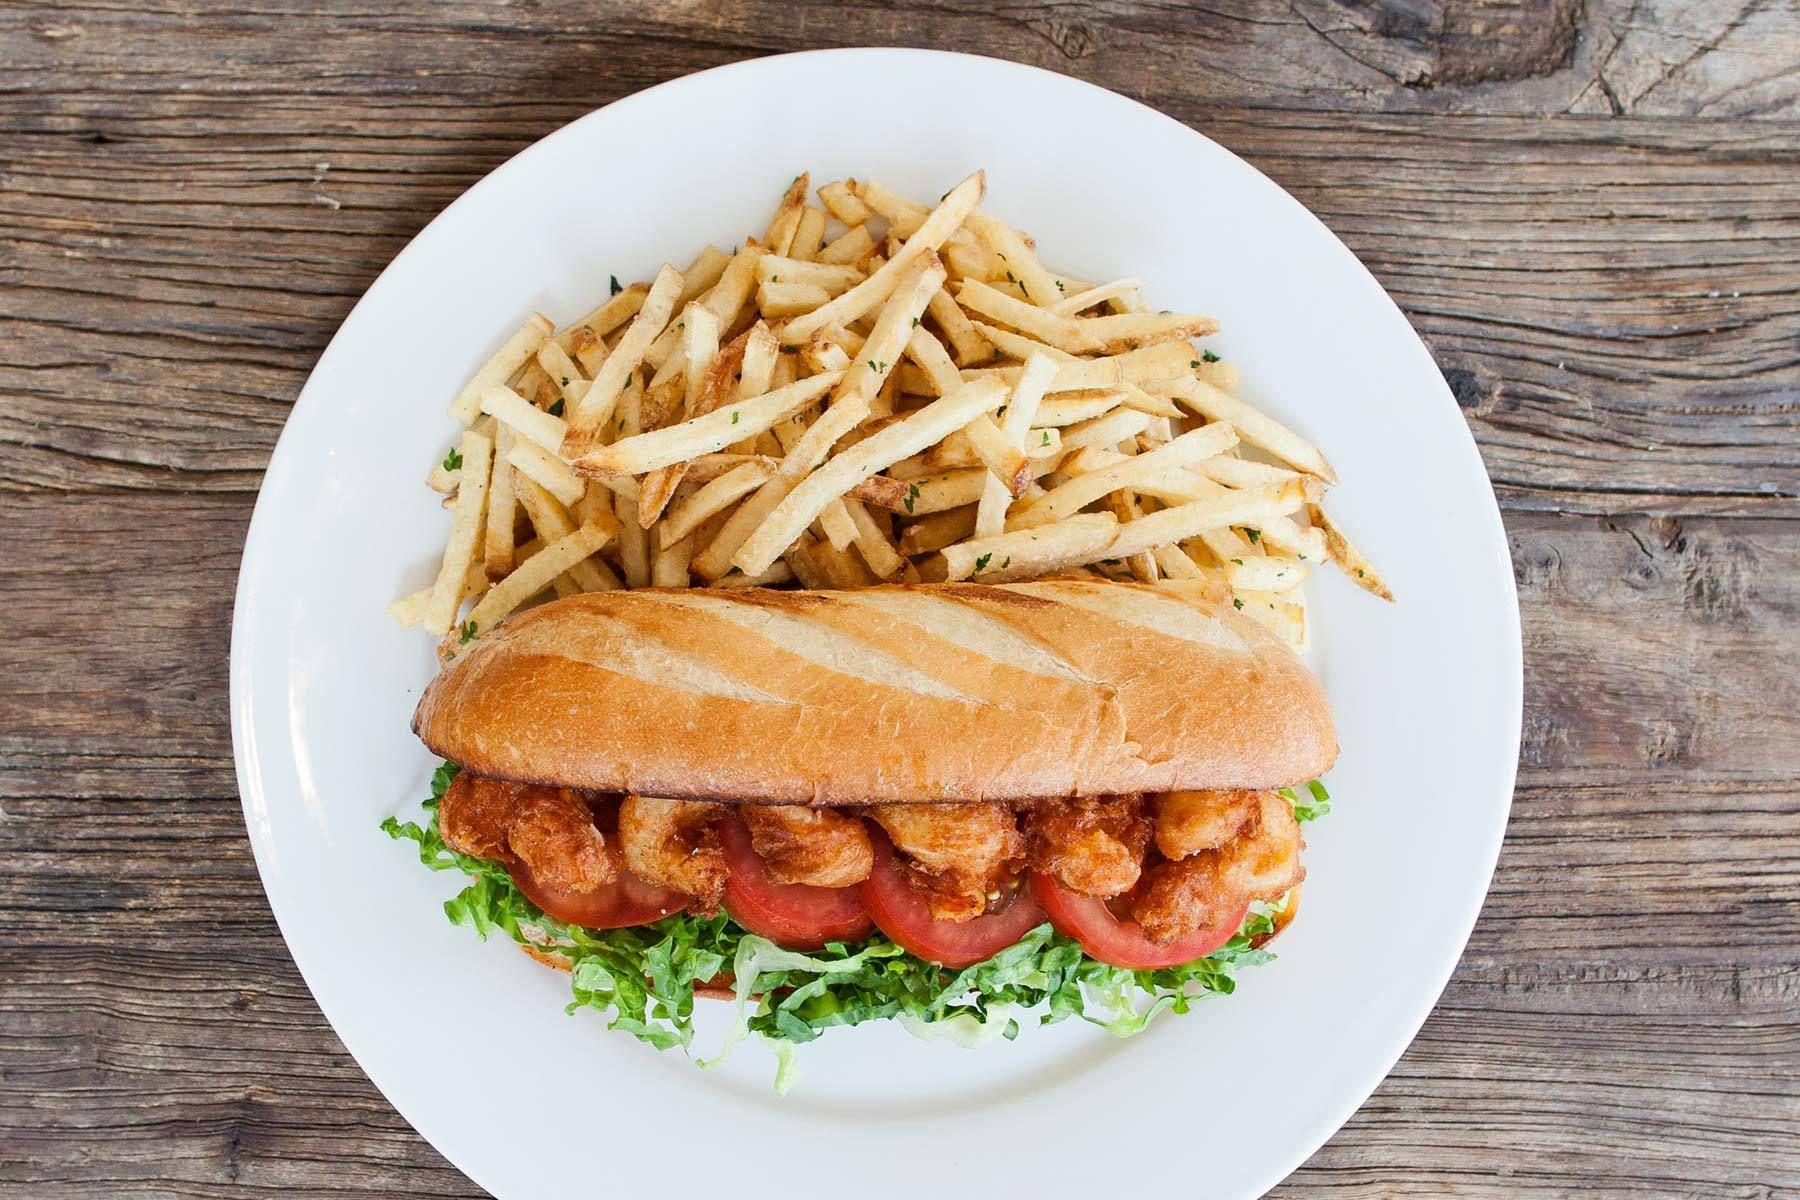 1crabsandwich.jpg